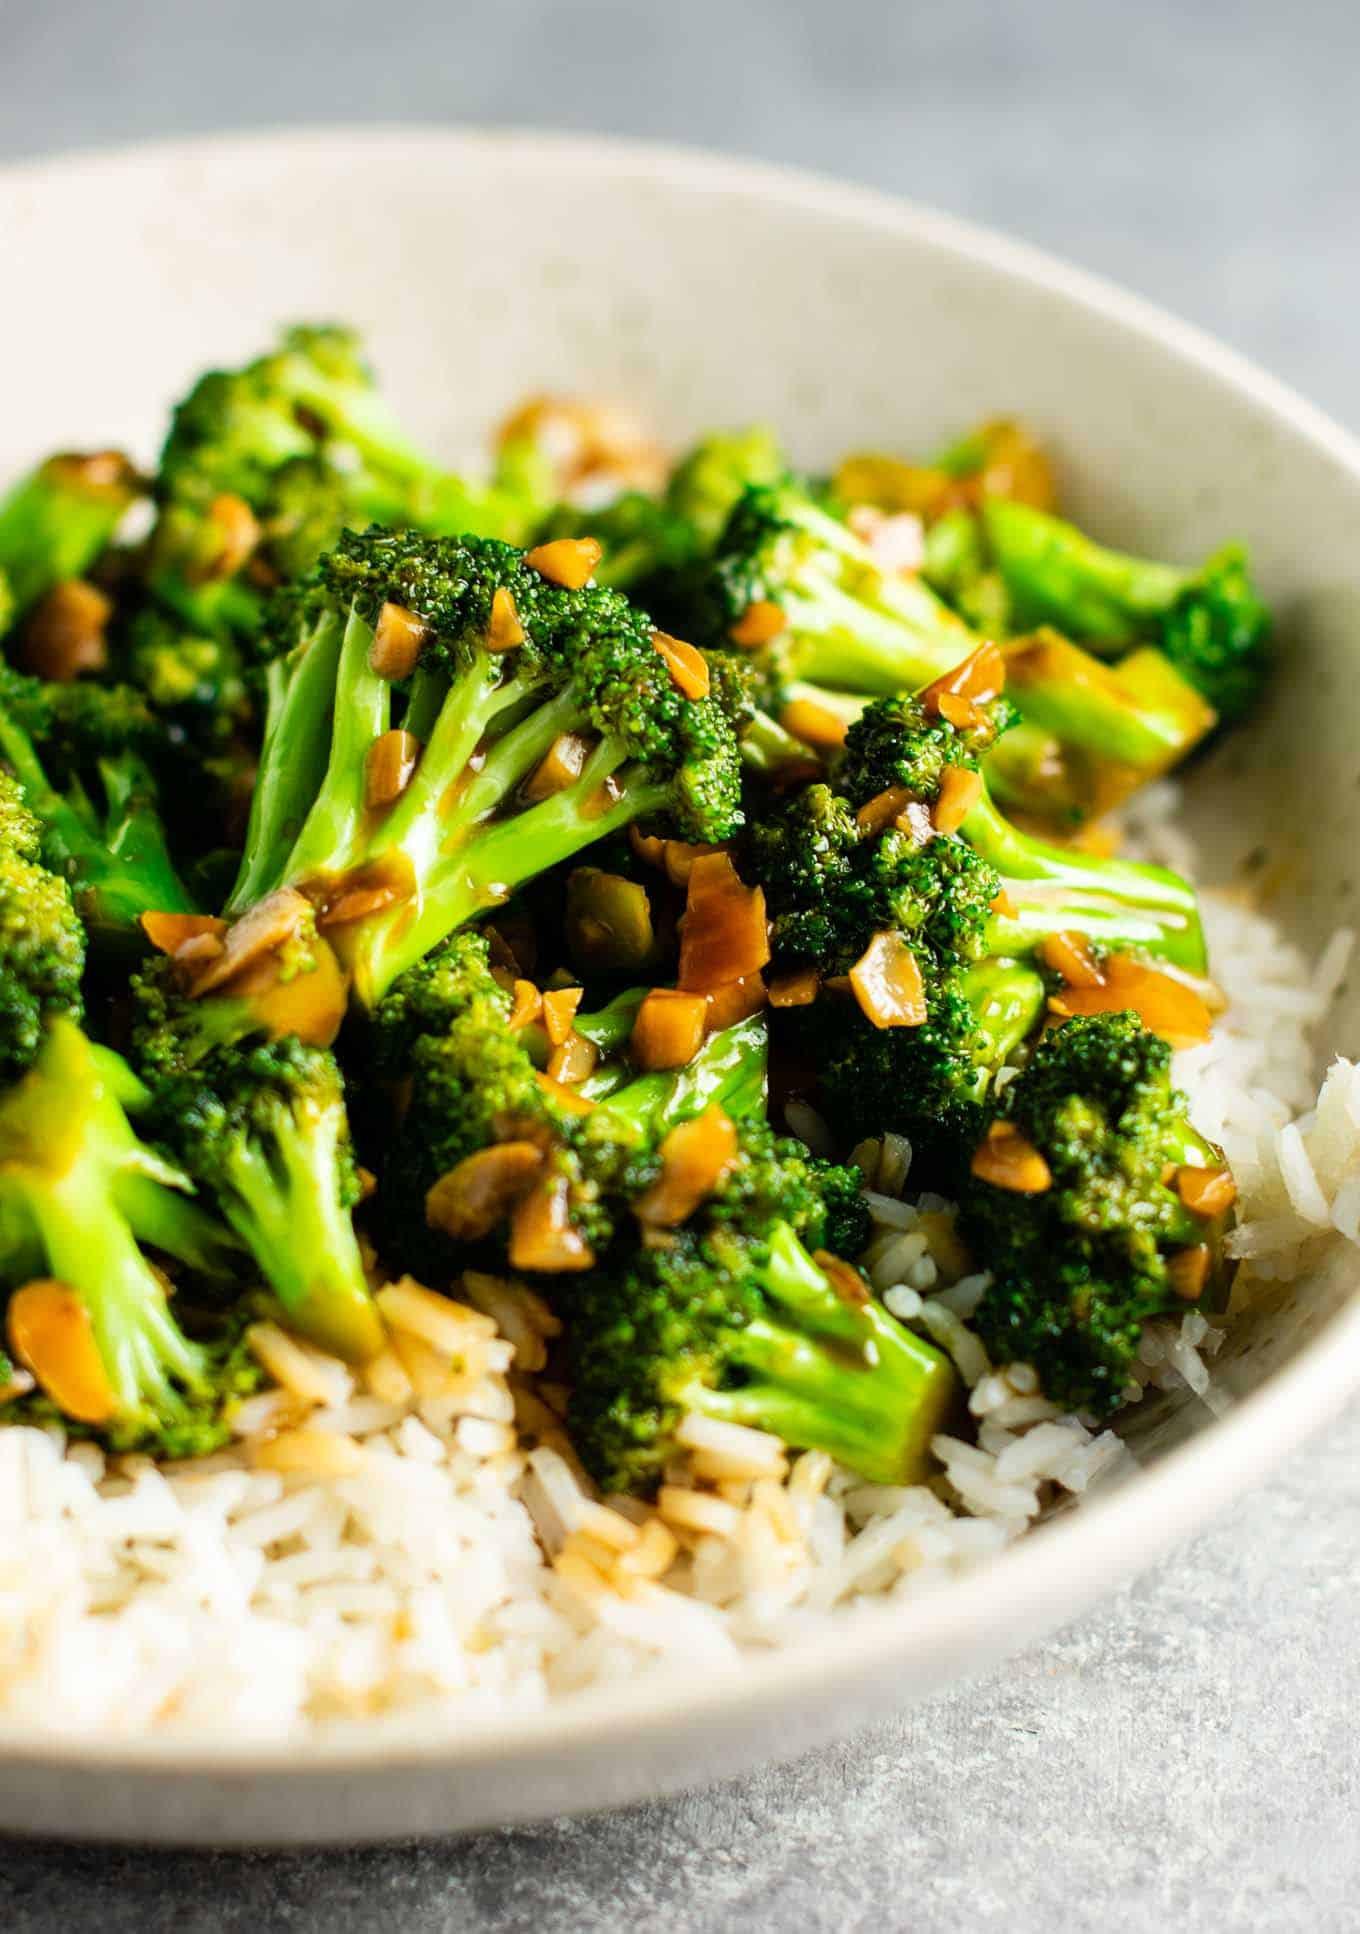 Chinese Broccoli Recipe  Broccoli with Garlic Sauce Recipe Build Your Bite